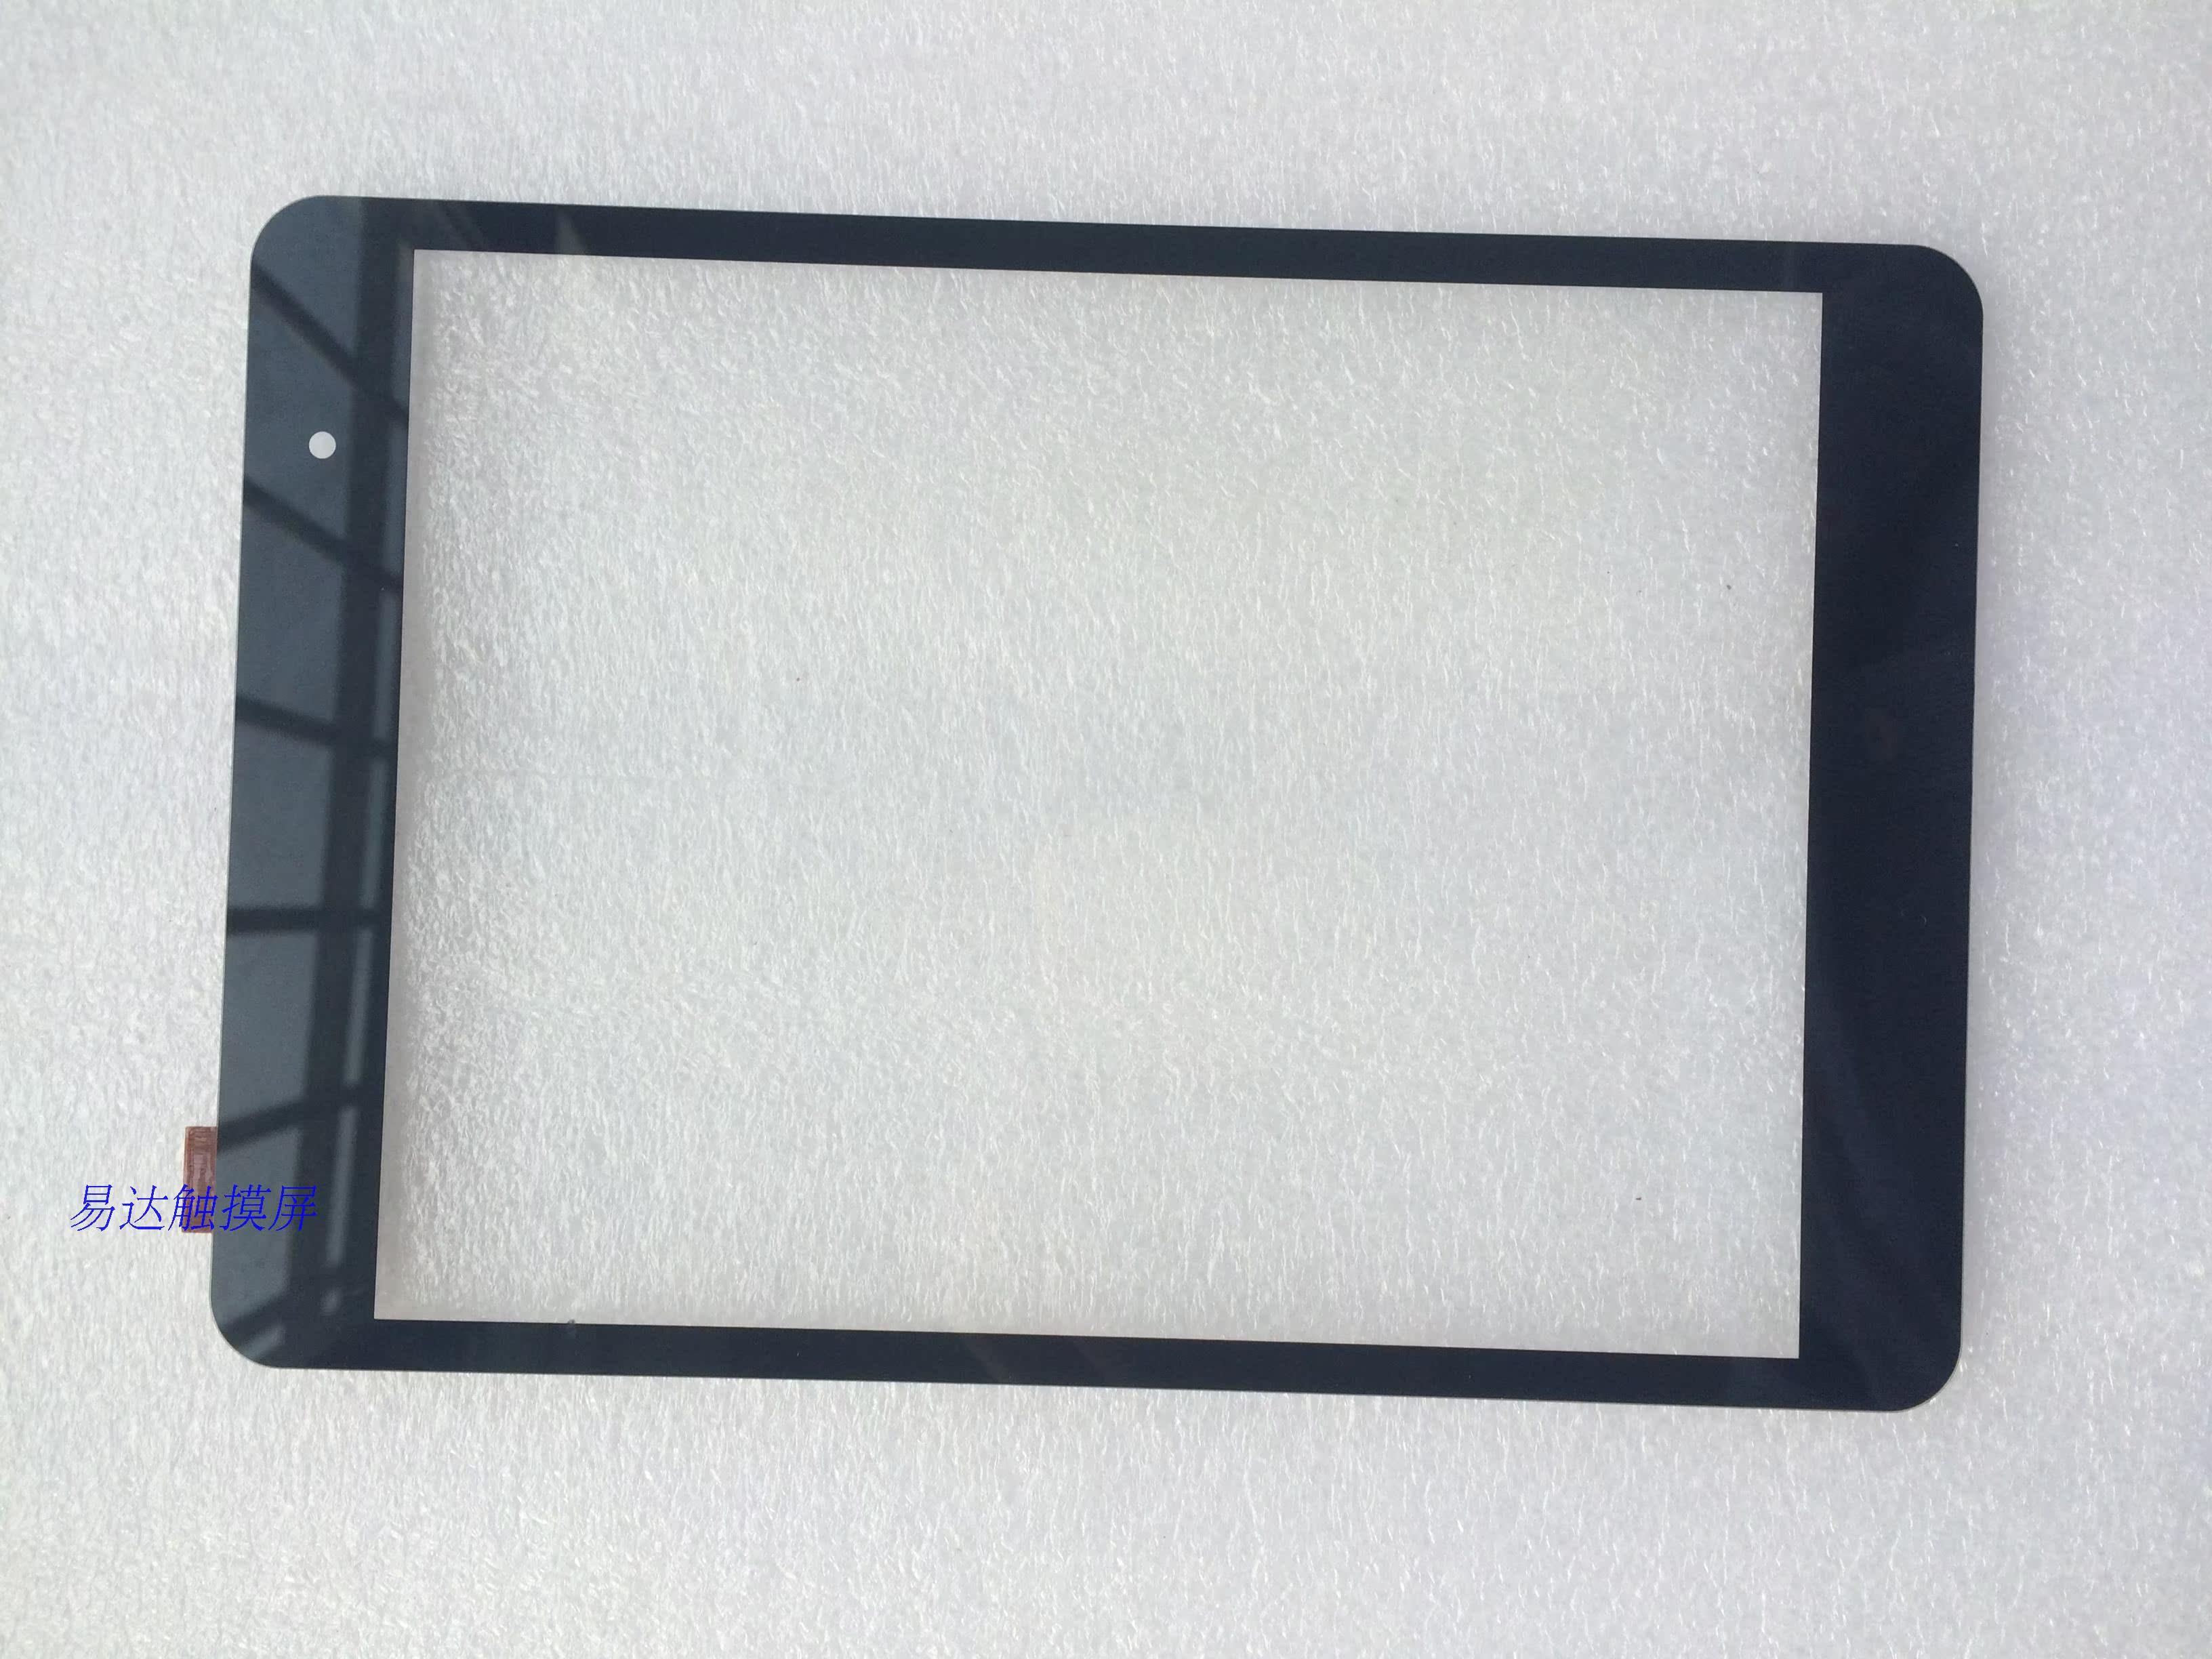 Запчасти для планшетных устройств   ZLD078002R784-F-D мазда326 f 1996года выпуска на запчасти куплю гомель